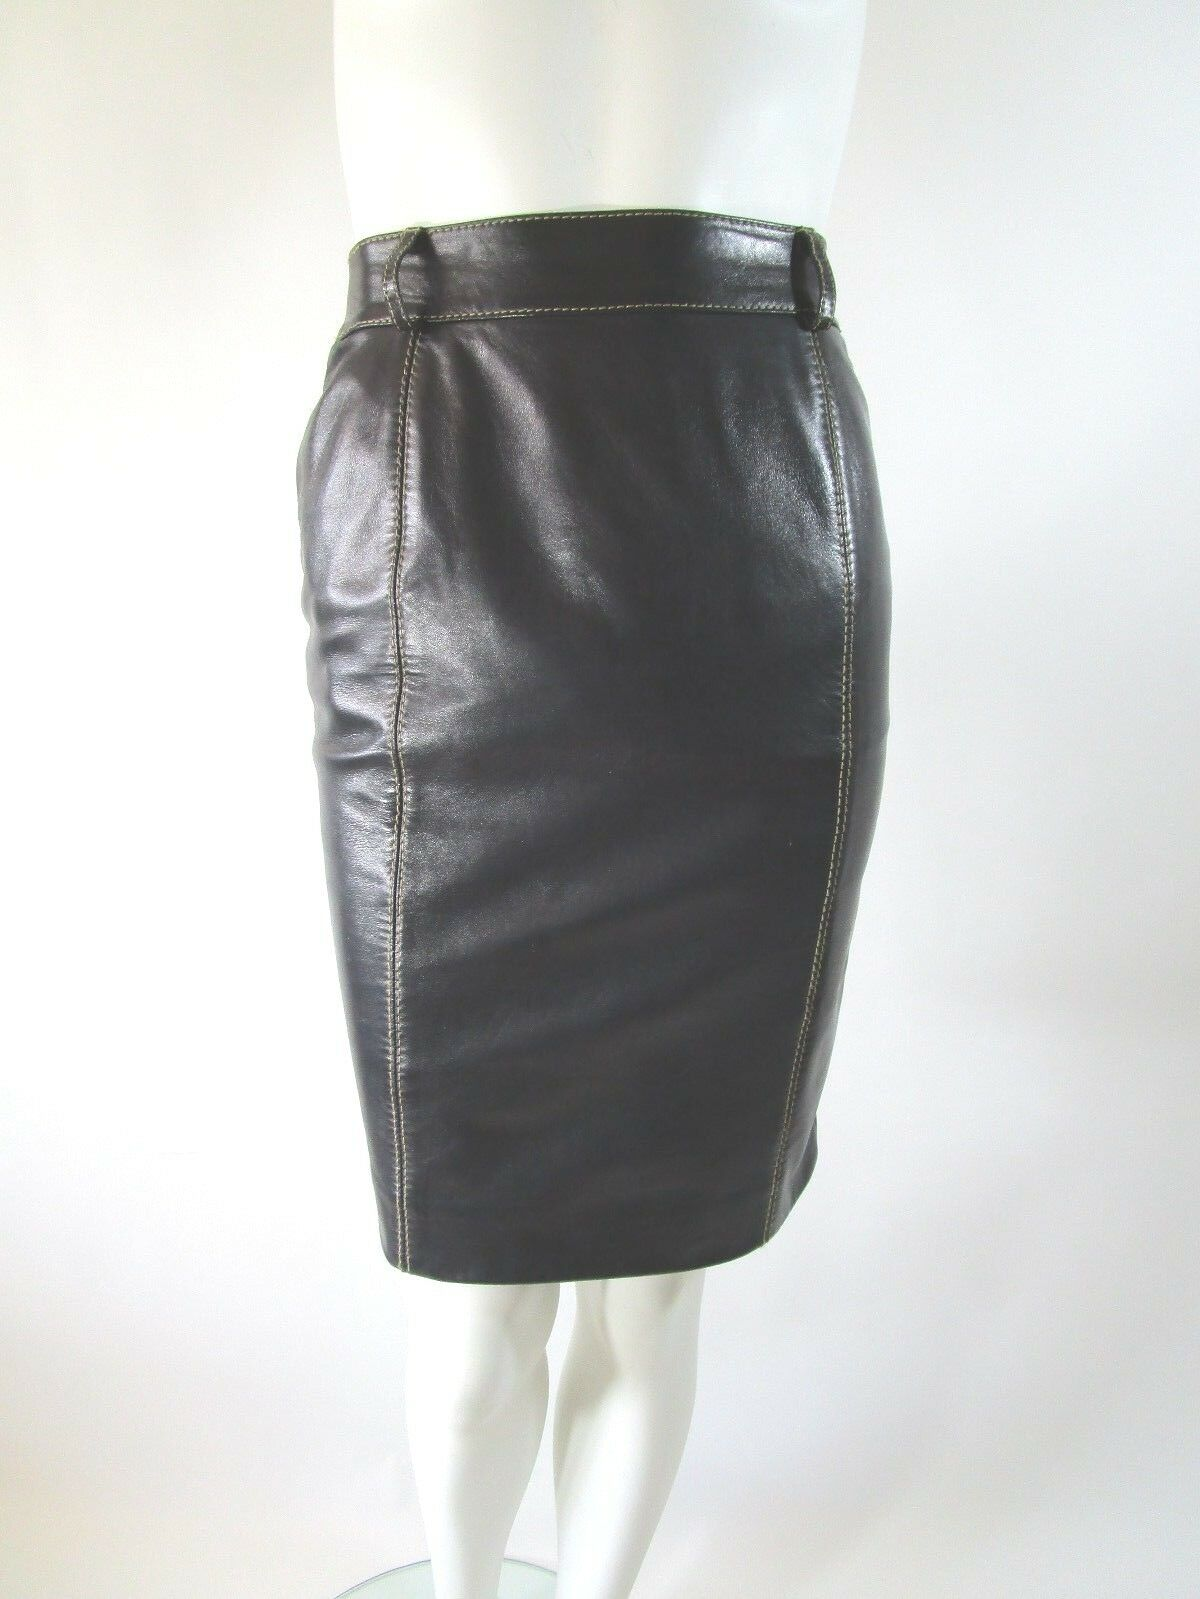 Vintage ESCADA Dark Brown Butter Soft Leather Contrast Stitch Pencil Skirt 34